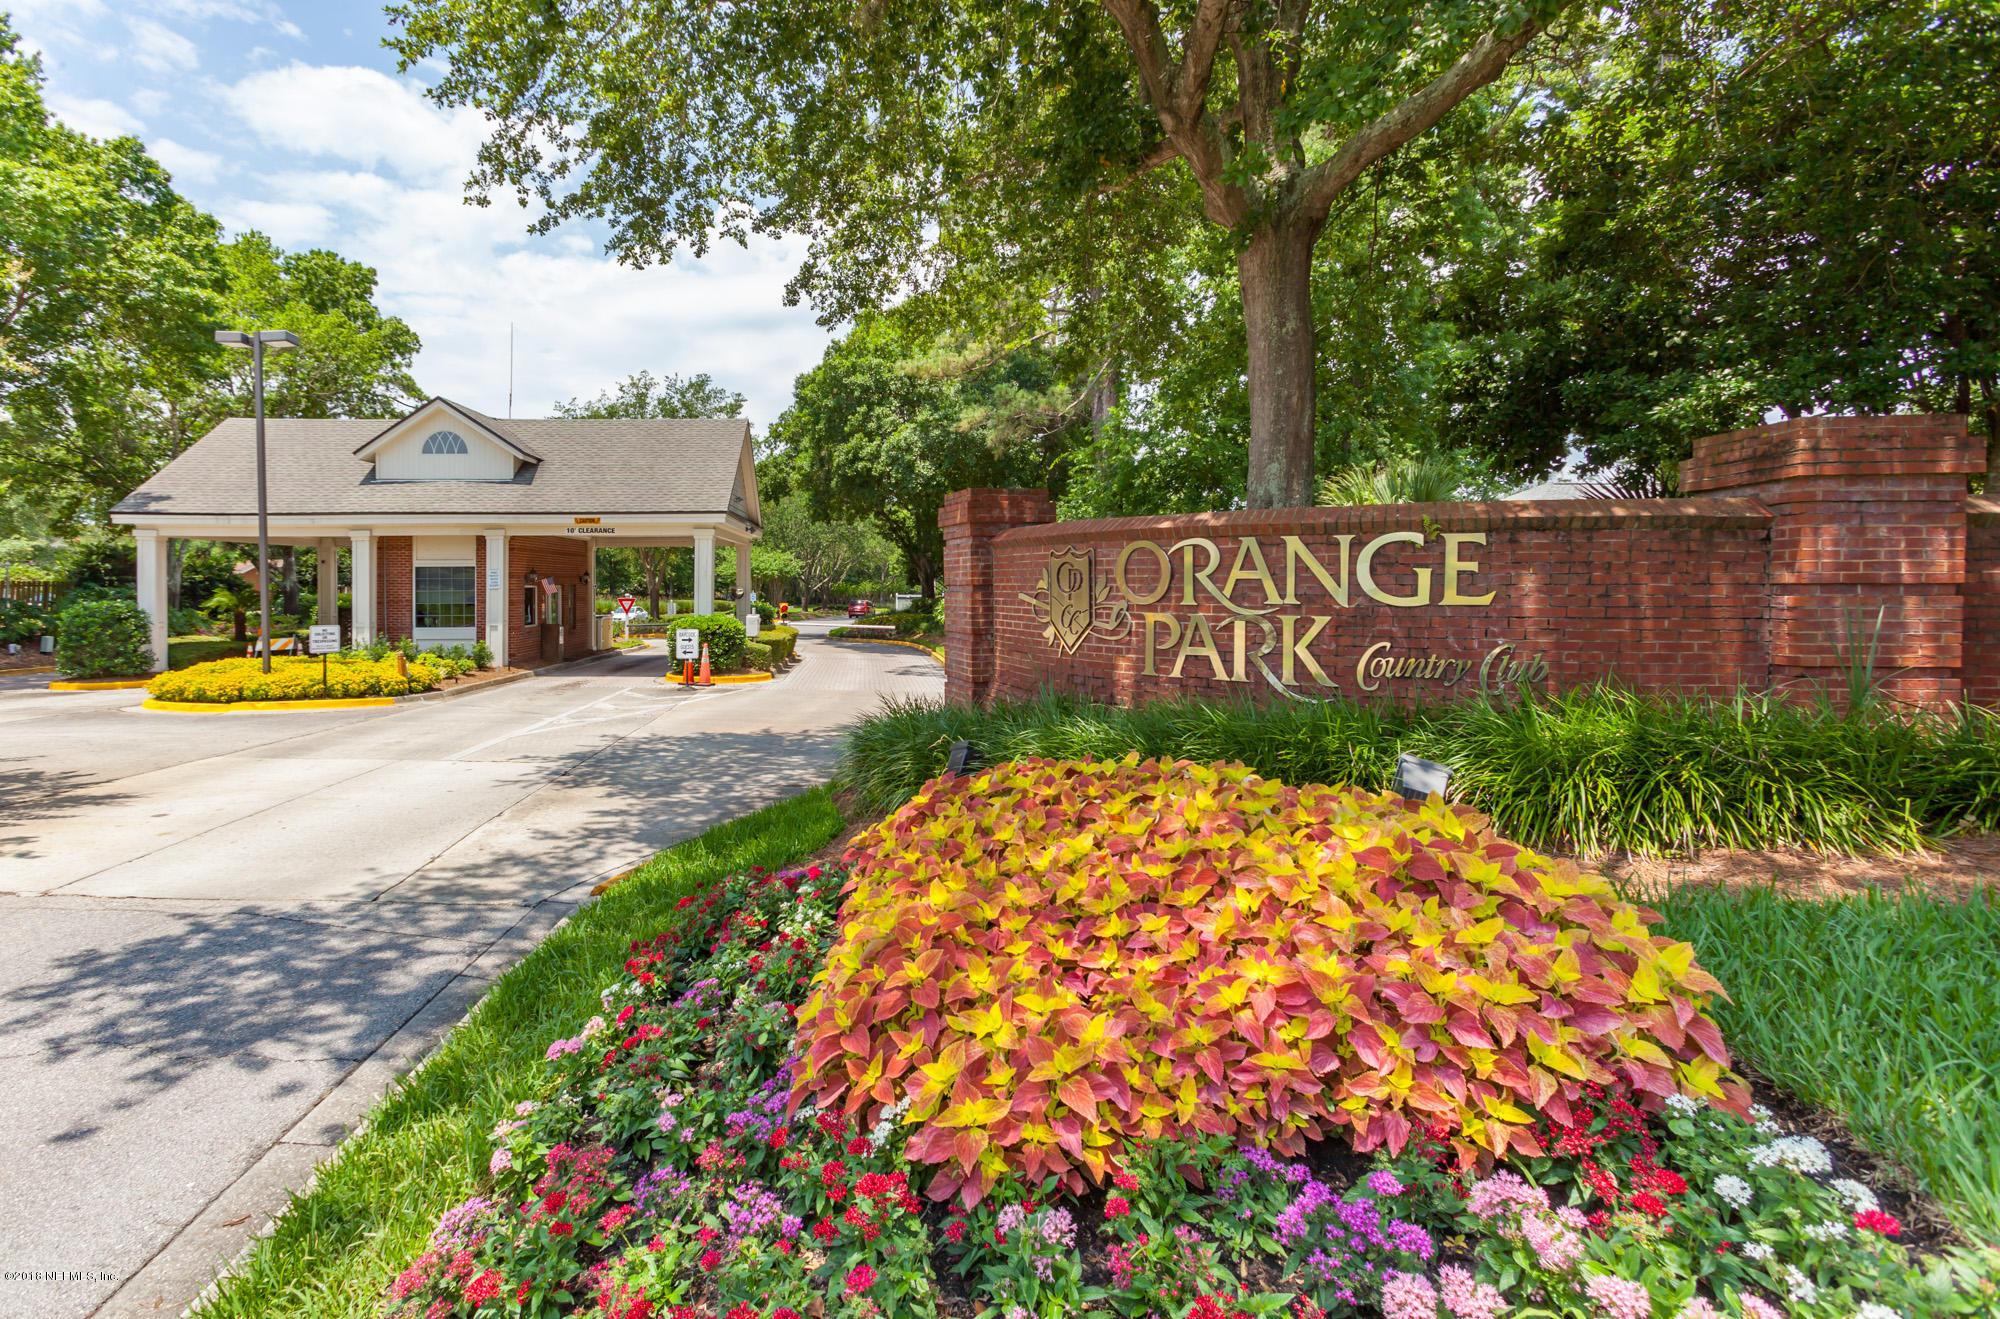 645 THORNWOOD, ORANGE PARK, FLORIDA 32073, 4 Bedrooms Bedrooms, ,3 BathroomsBathrooms,Residential - single family,For sale,THORNWOOD,966098